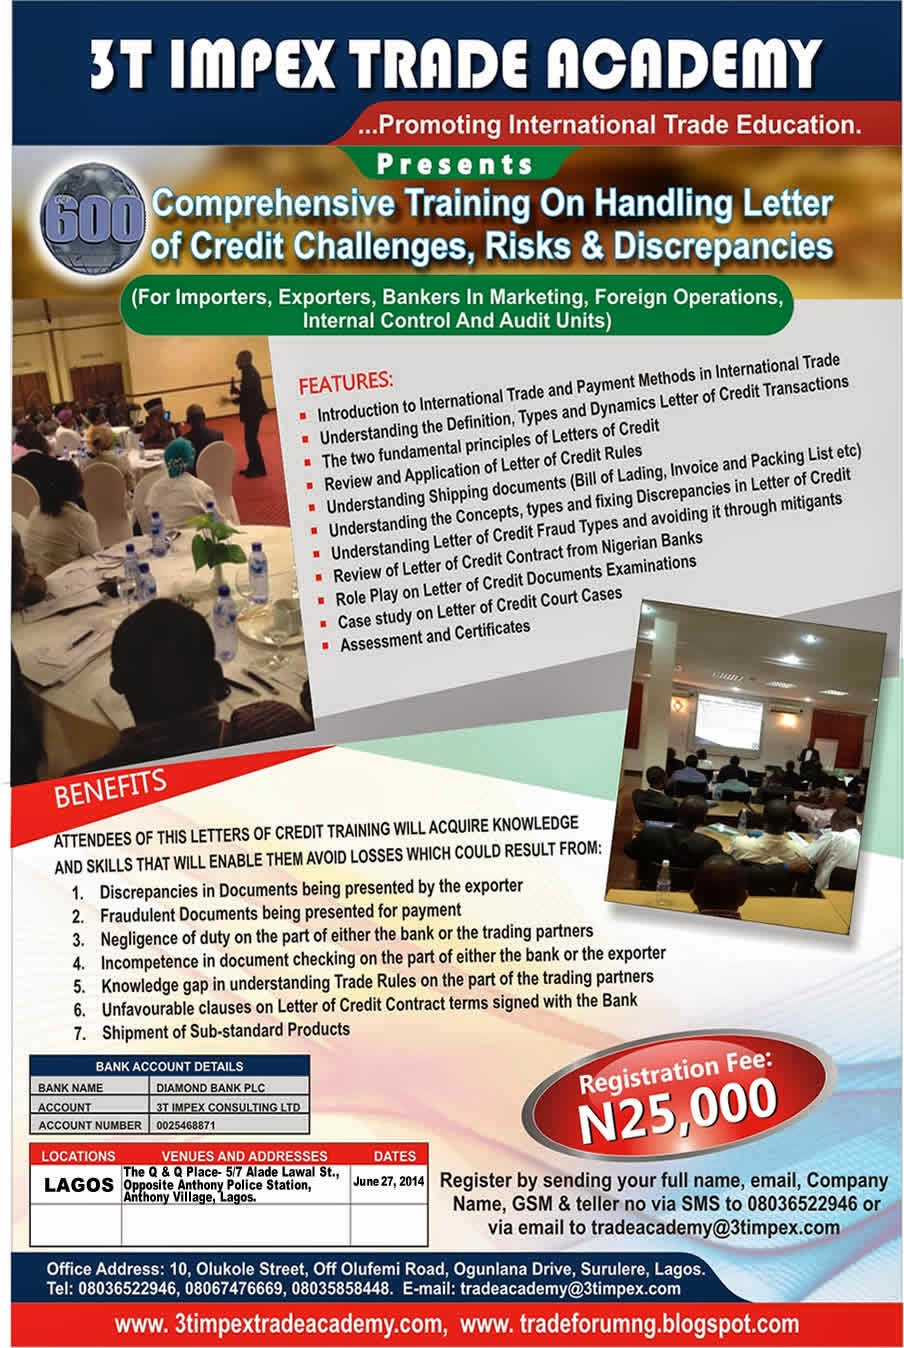 Nigeria to export ceramic tiles official premium times nigeria - Comprehensive Training On Letter Of Credit